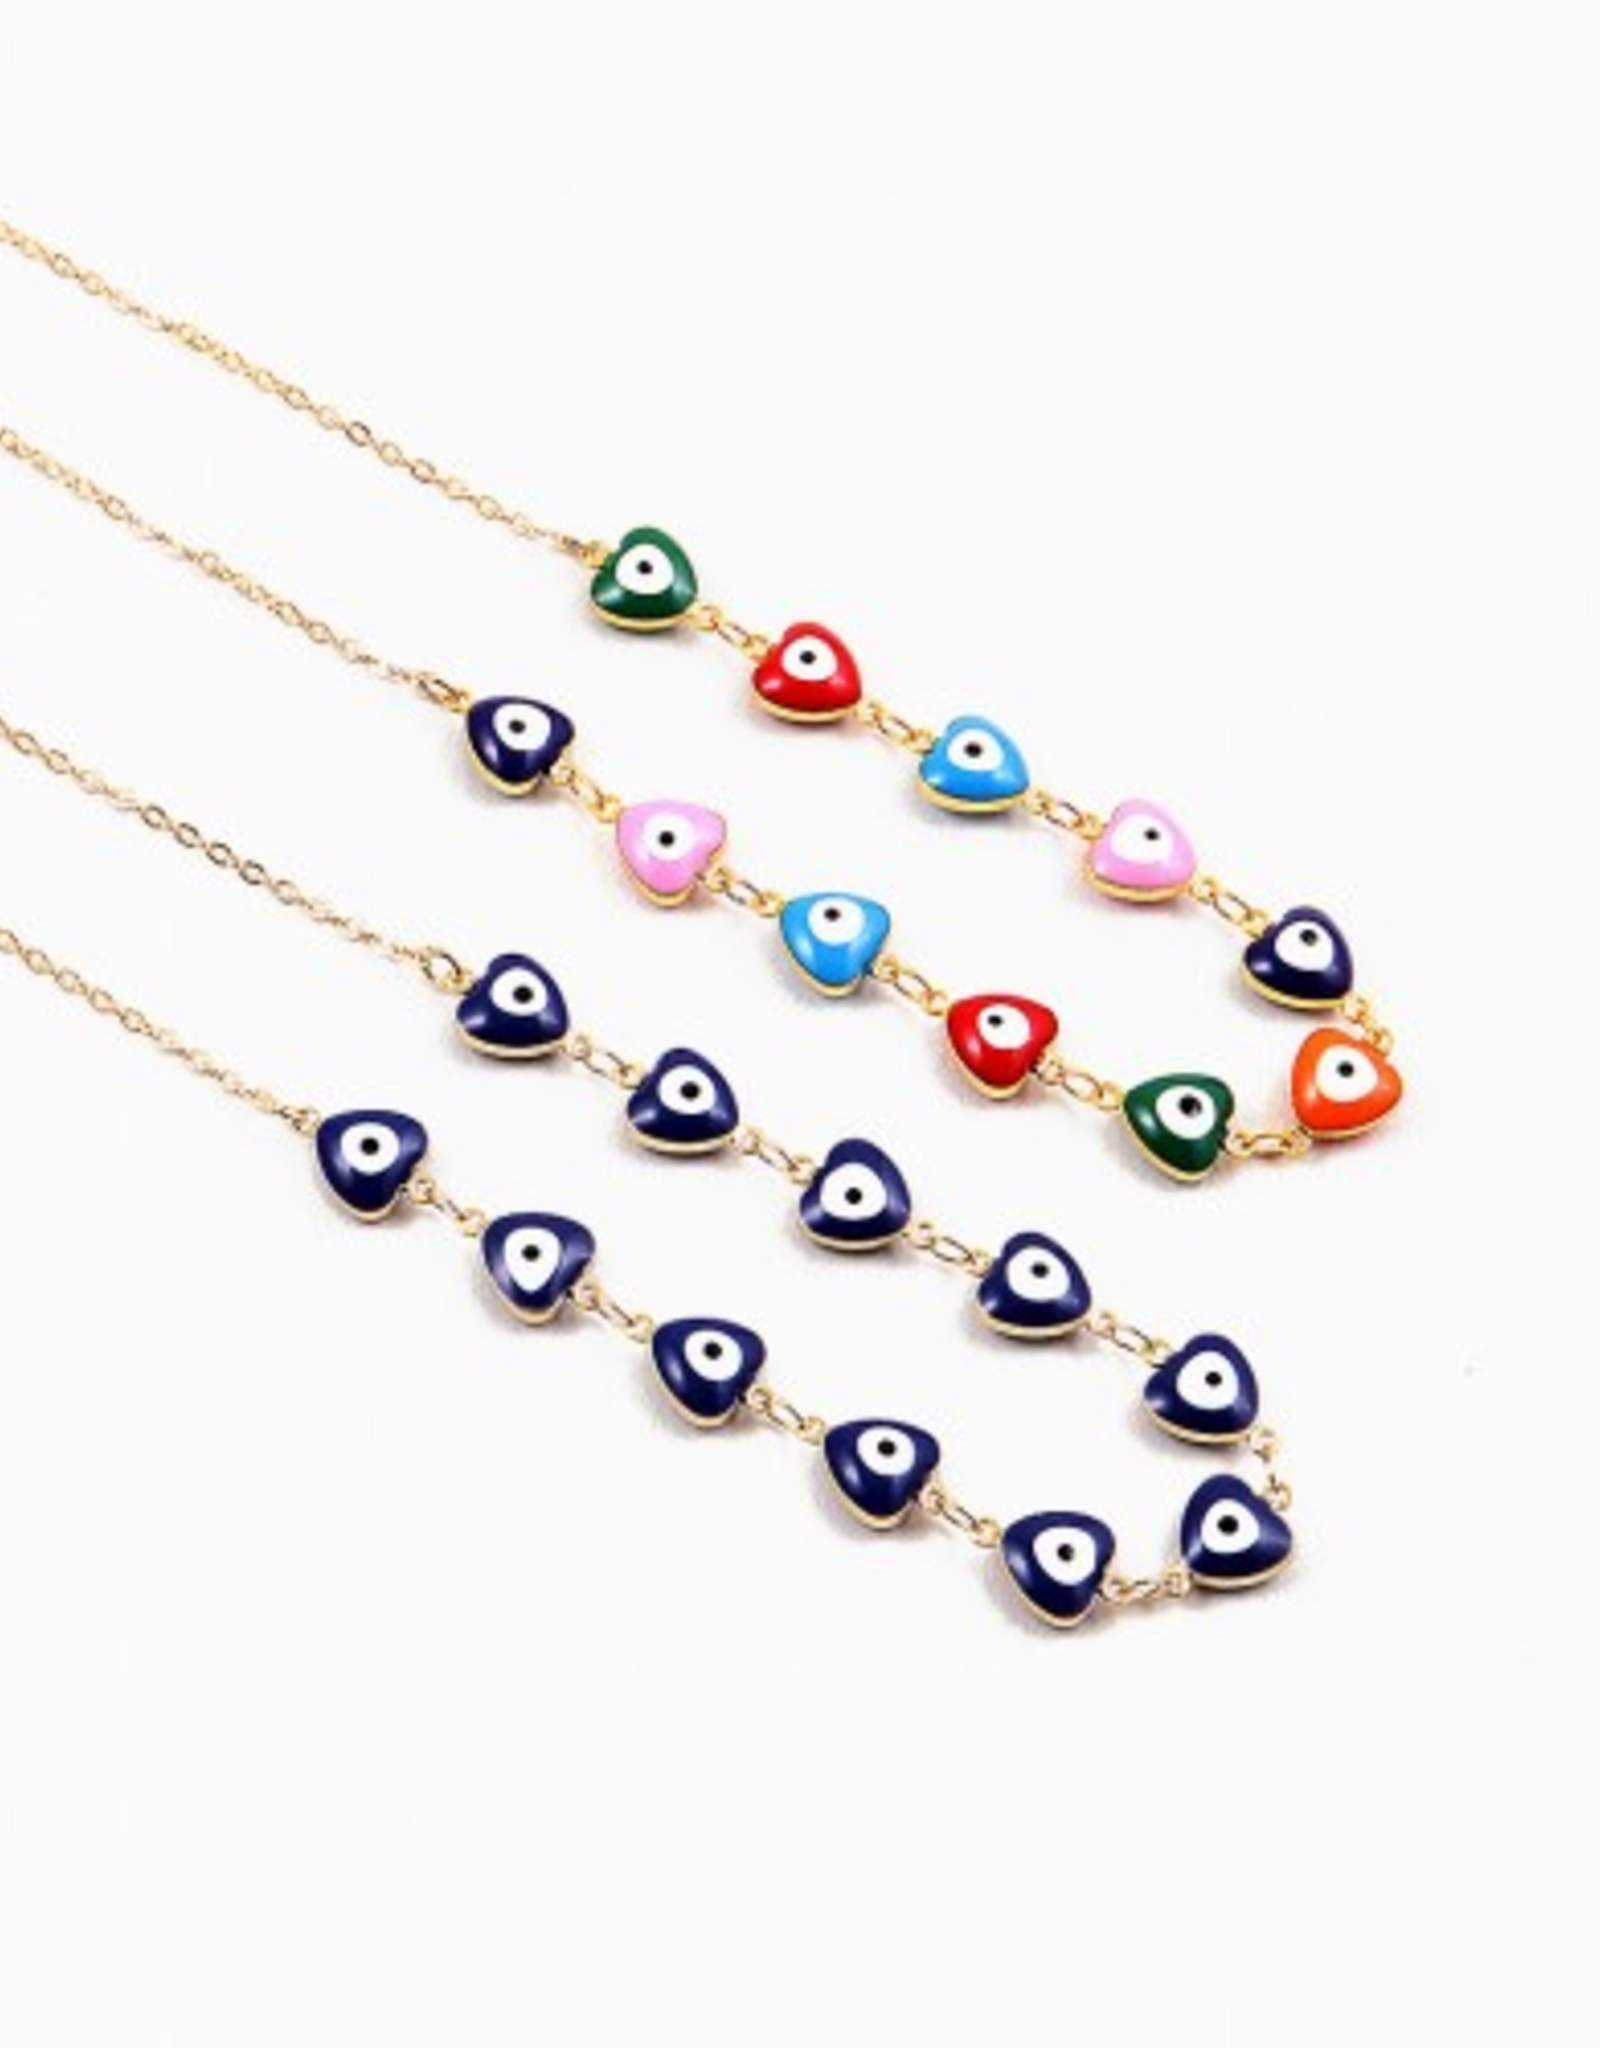 Blue Suede Jewels Evil Eye Necklace